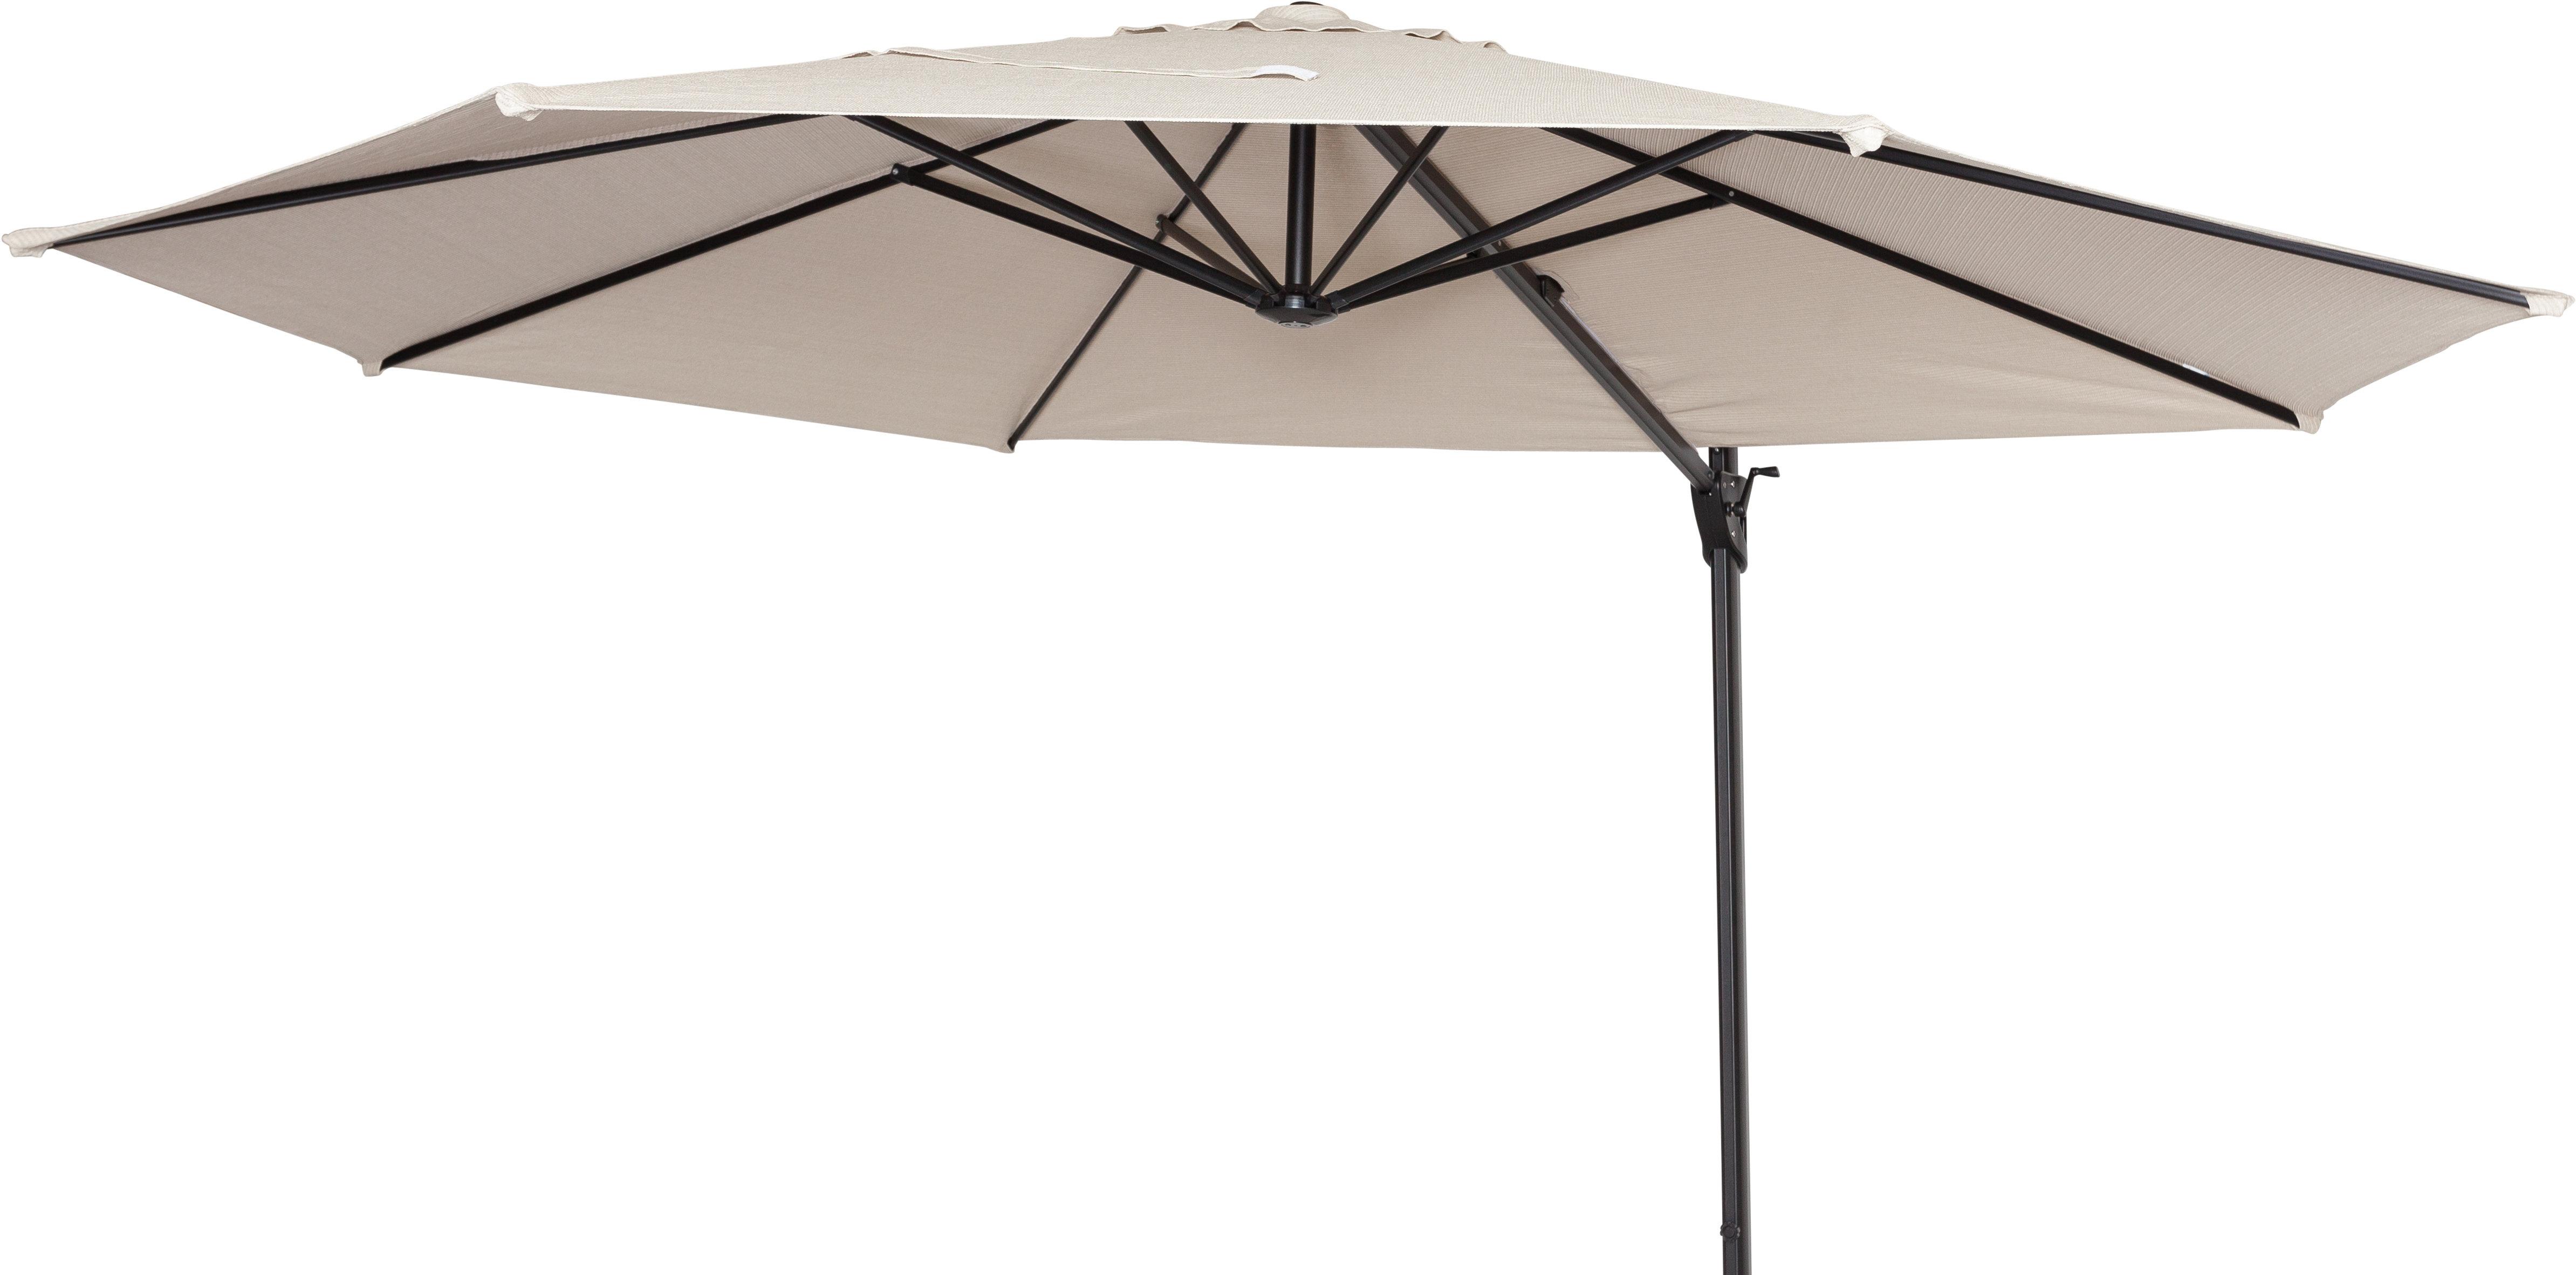 12' Cantilever Umbrella Throughout Well Known Fazeley  Rectangular Cantilever Umbrellas (View 3 of 20)